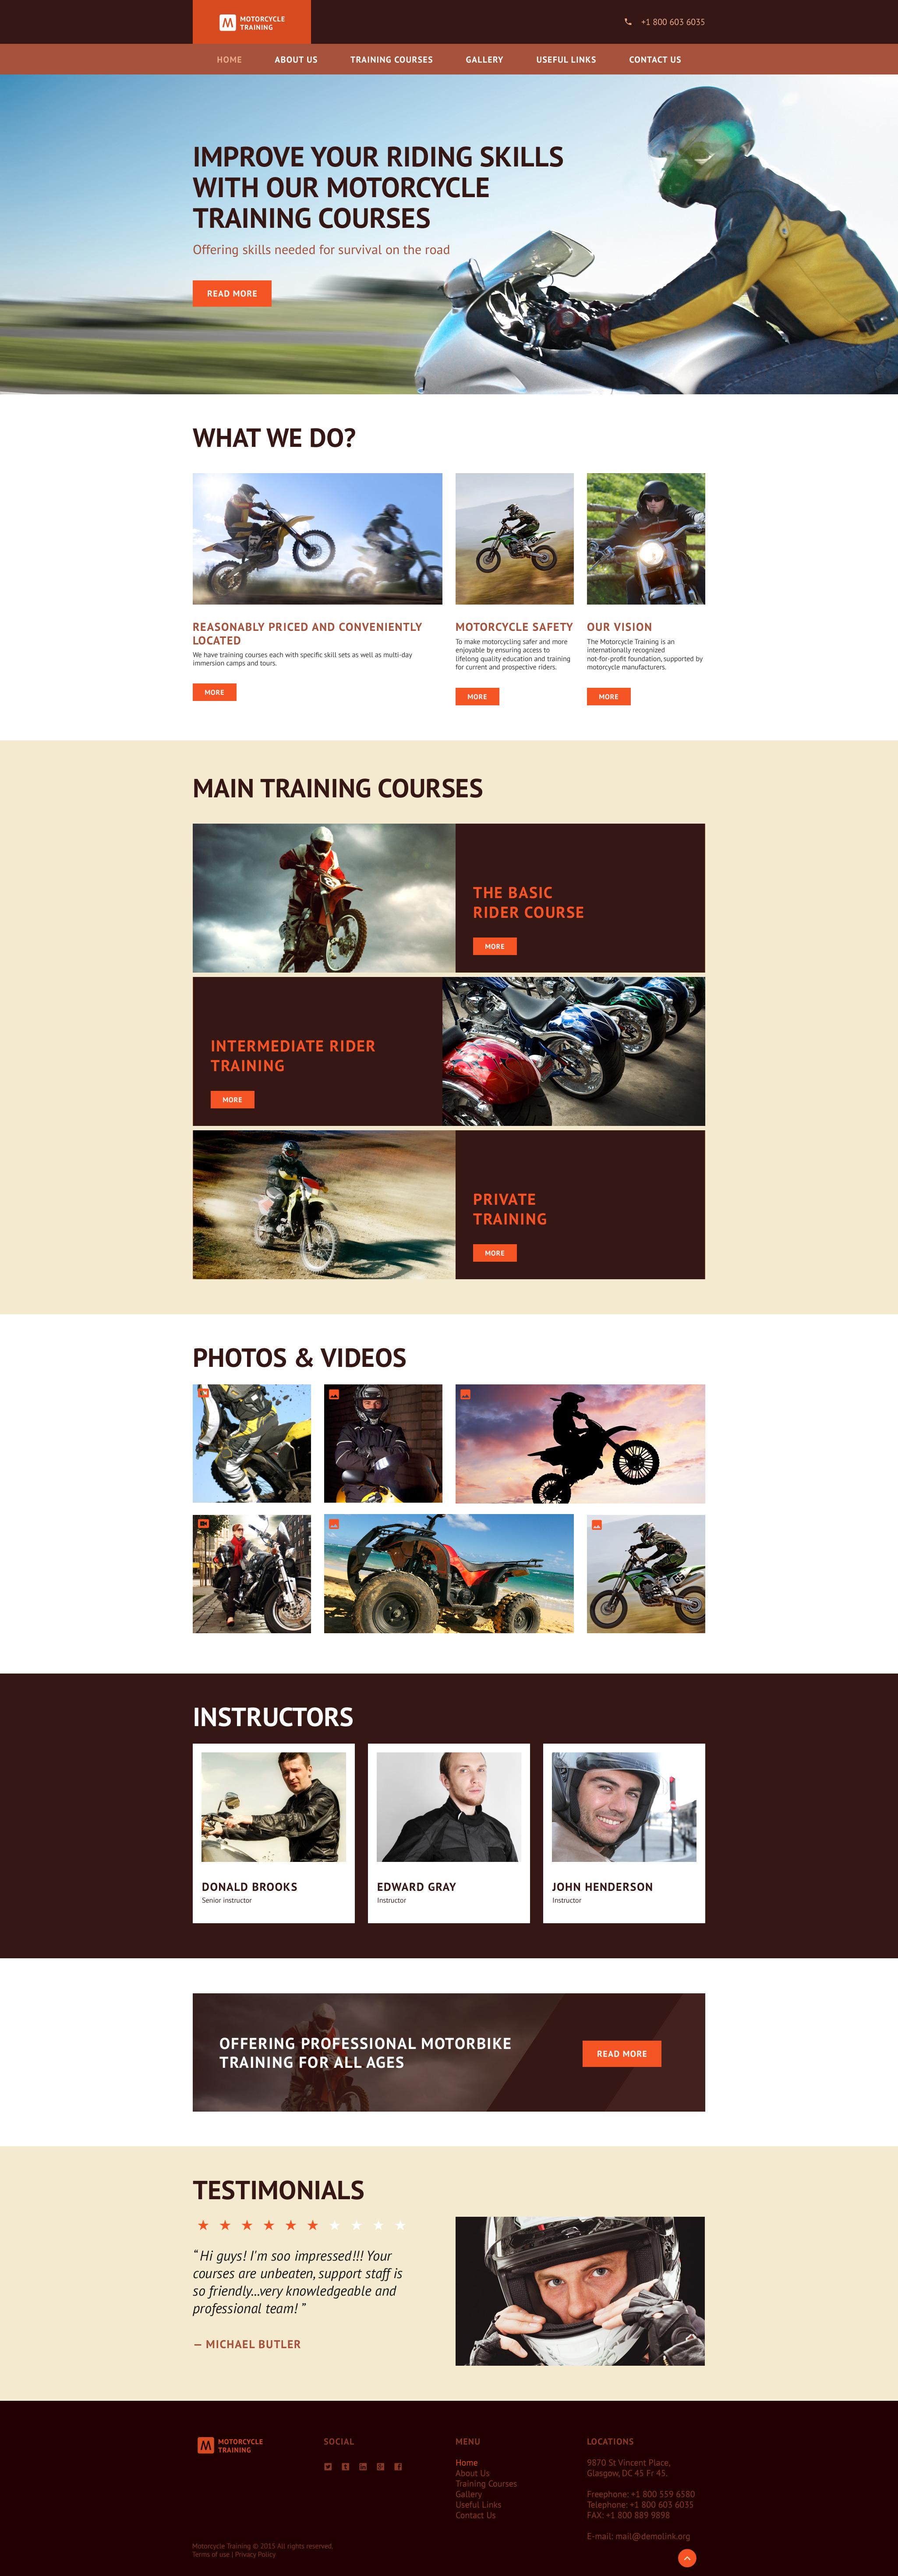 Motorcycle Training Template Web №55948 - screenshot